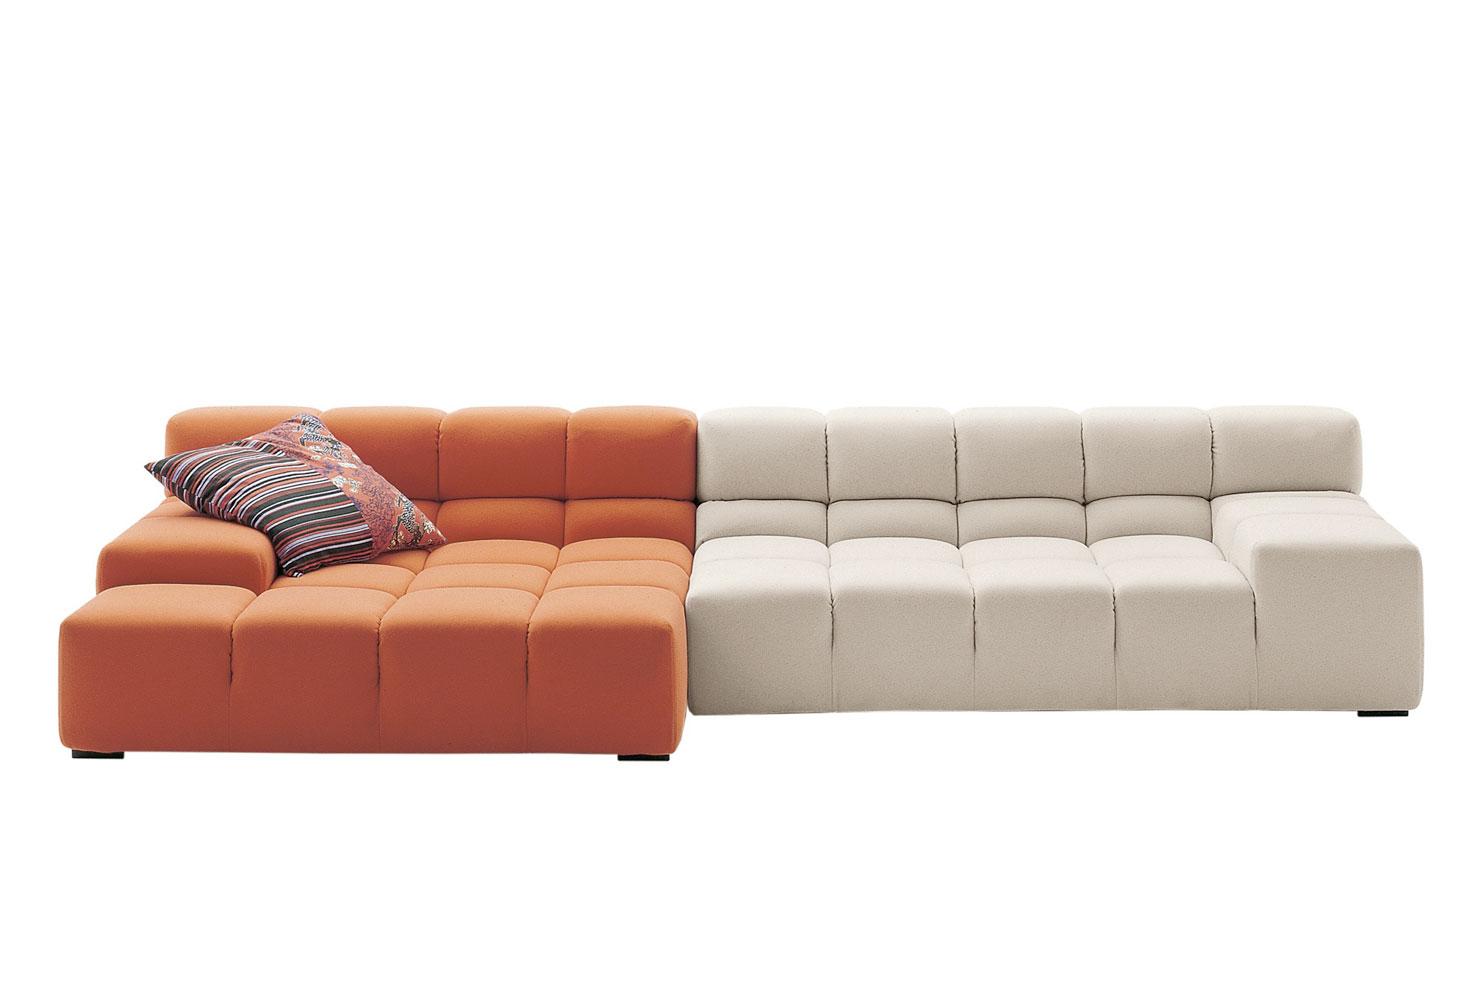 midori arakaki*: Muebles